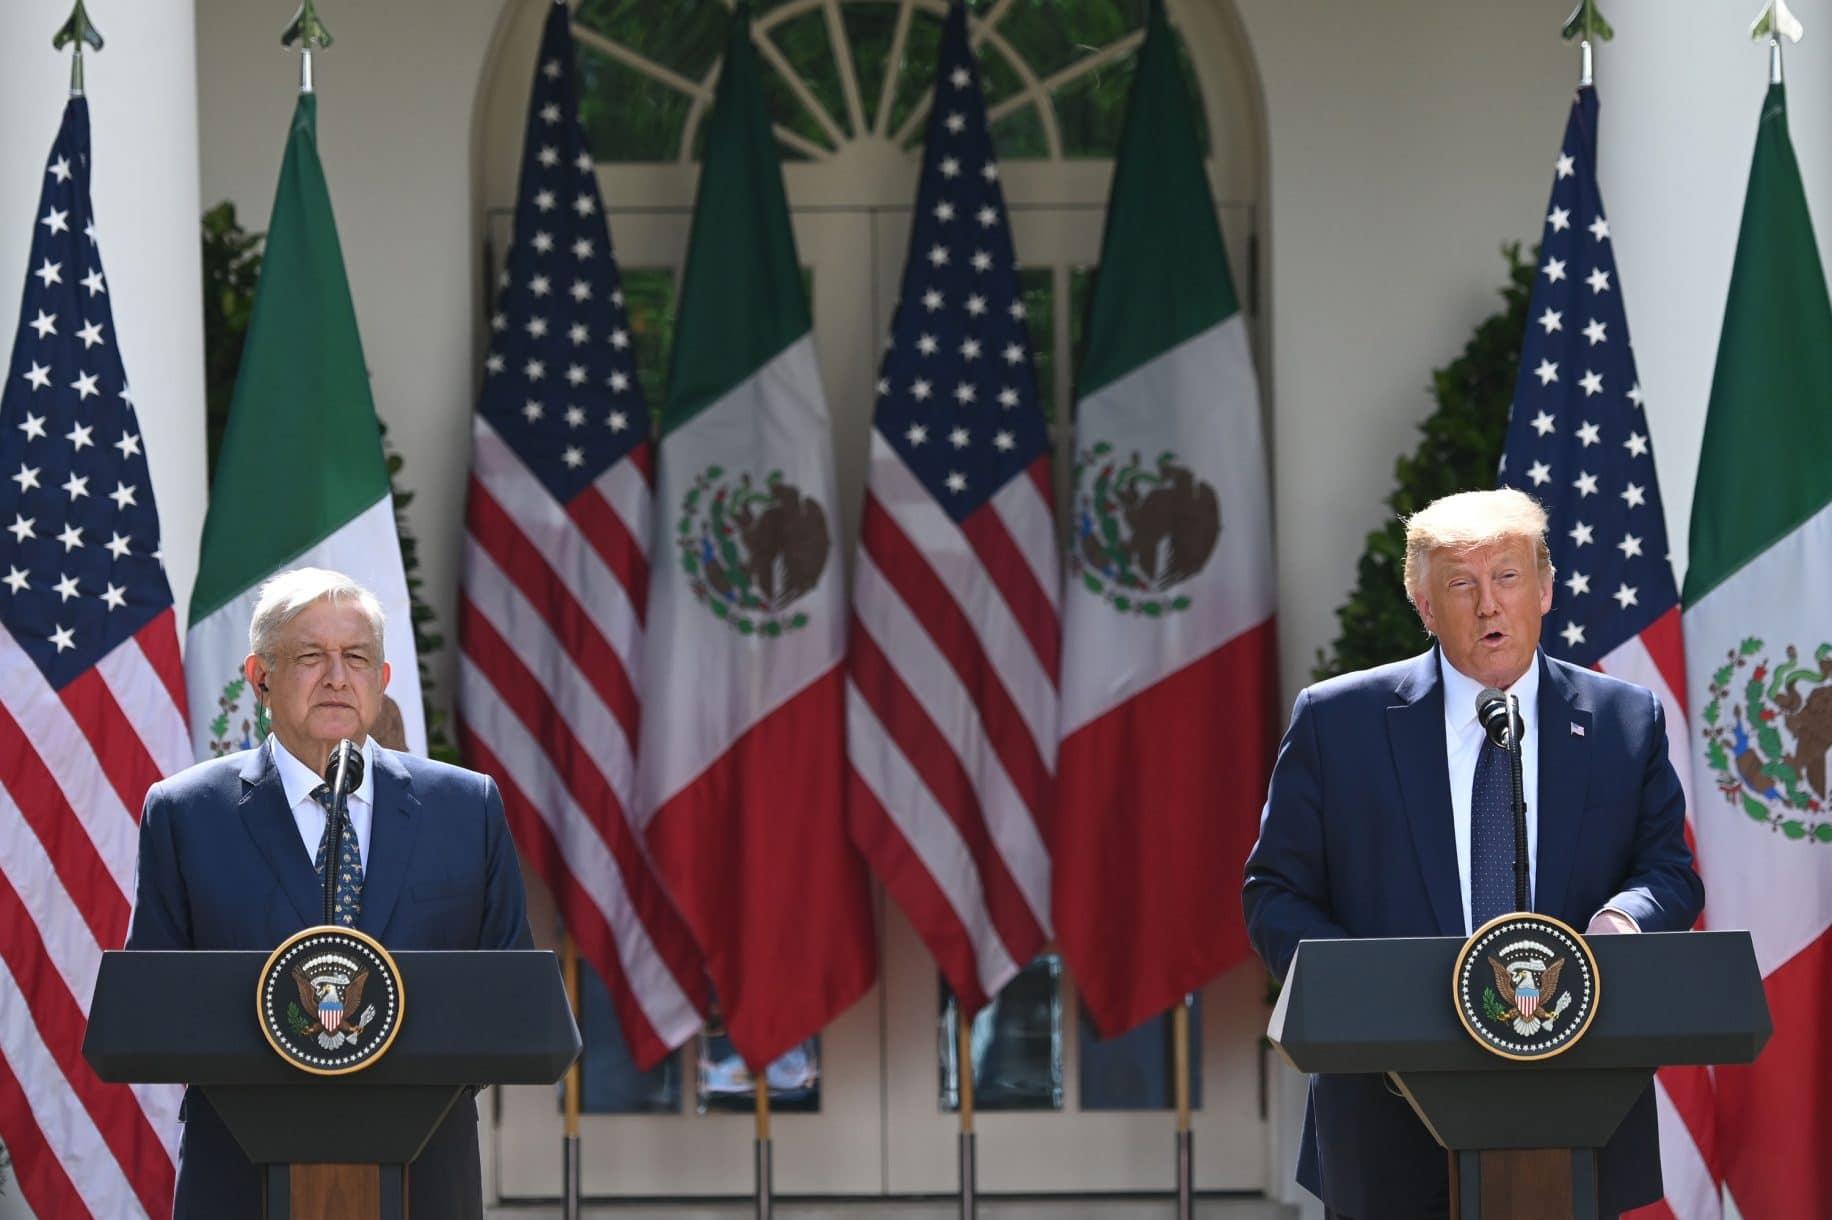 Mexican President Lopez Obrador thanks Trump for being 'increasingly respectful' toward Mexicans